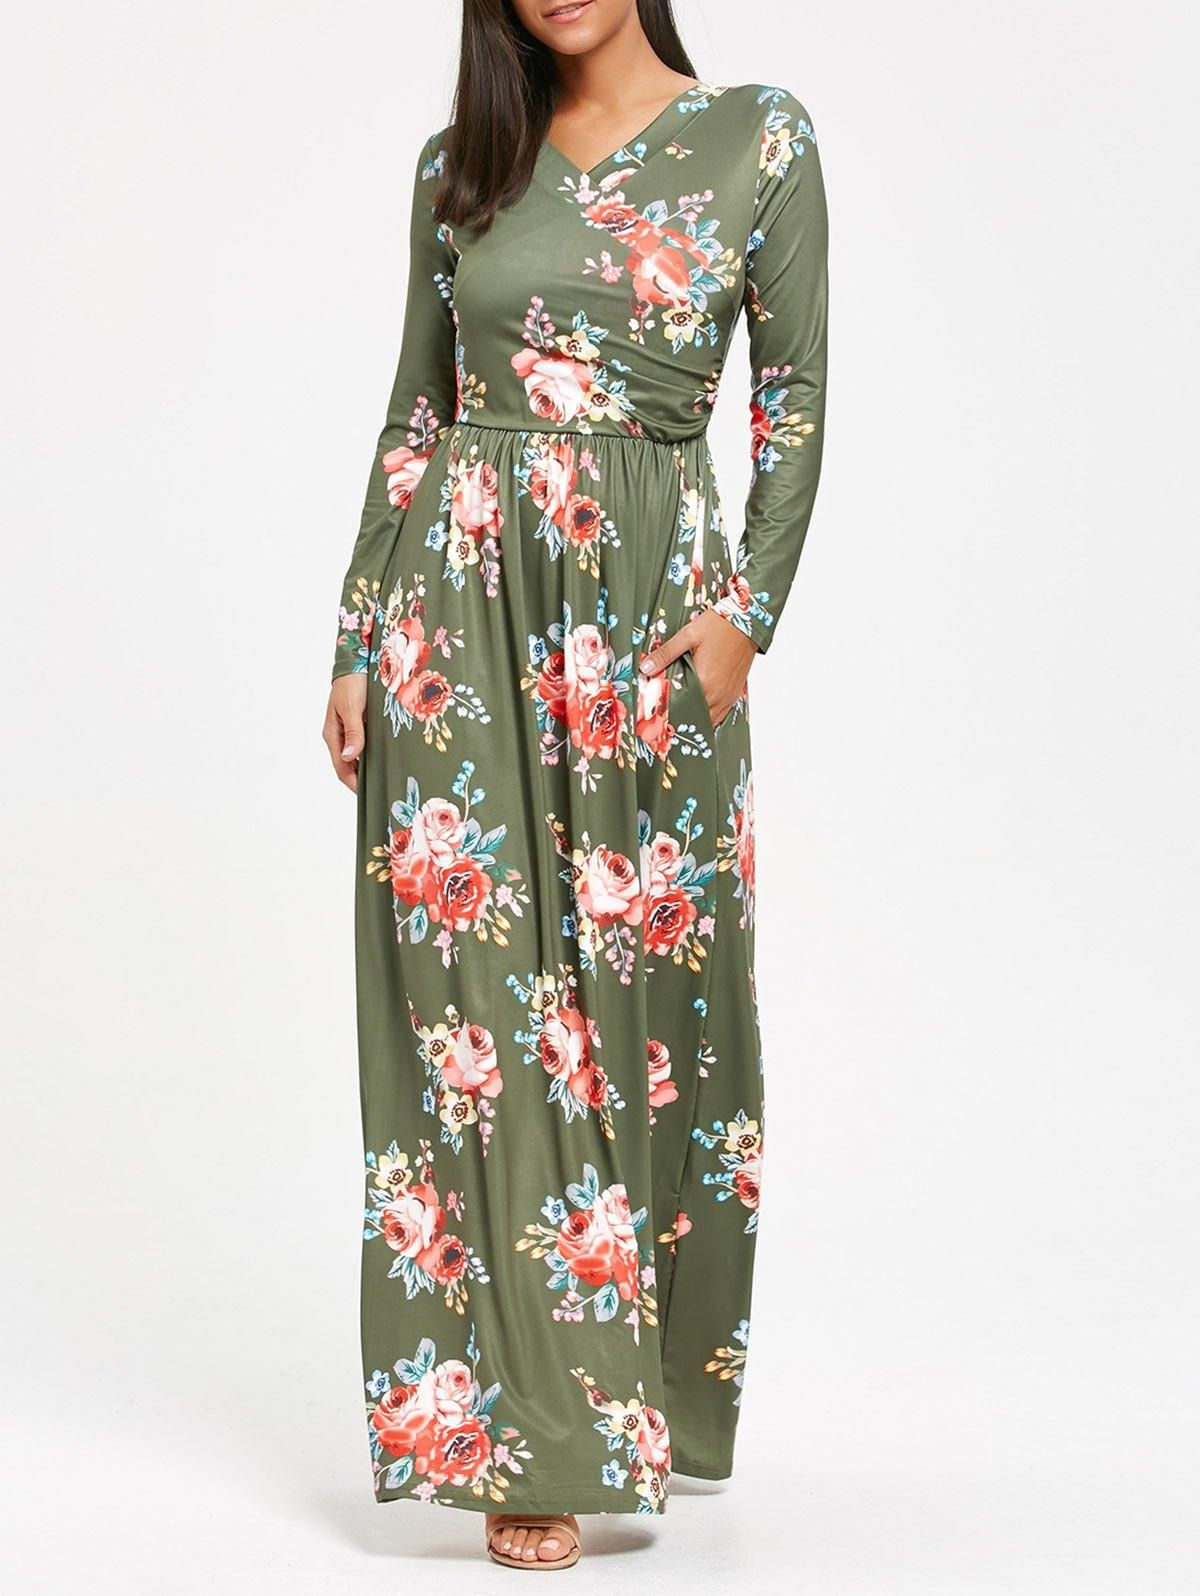 High waist long sleeve floral print maxi dress floral print maxi